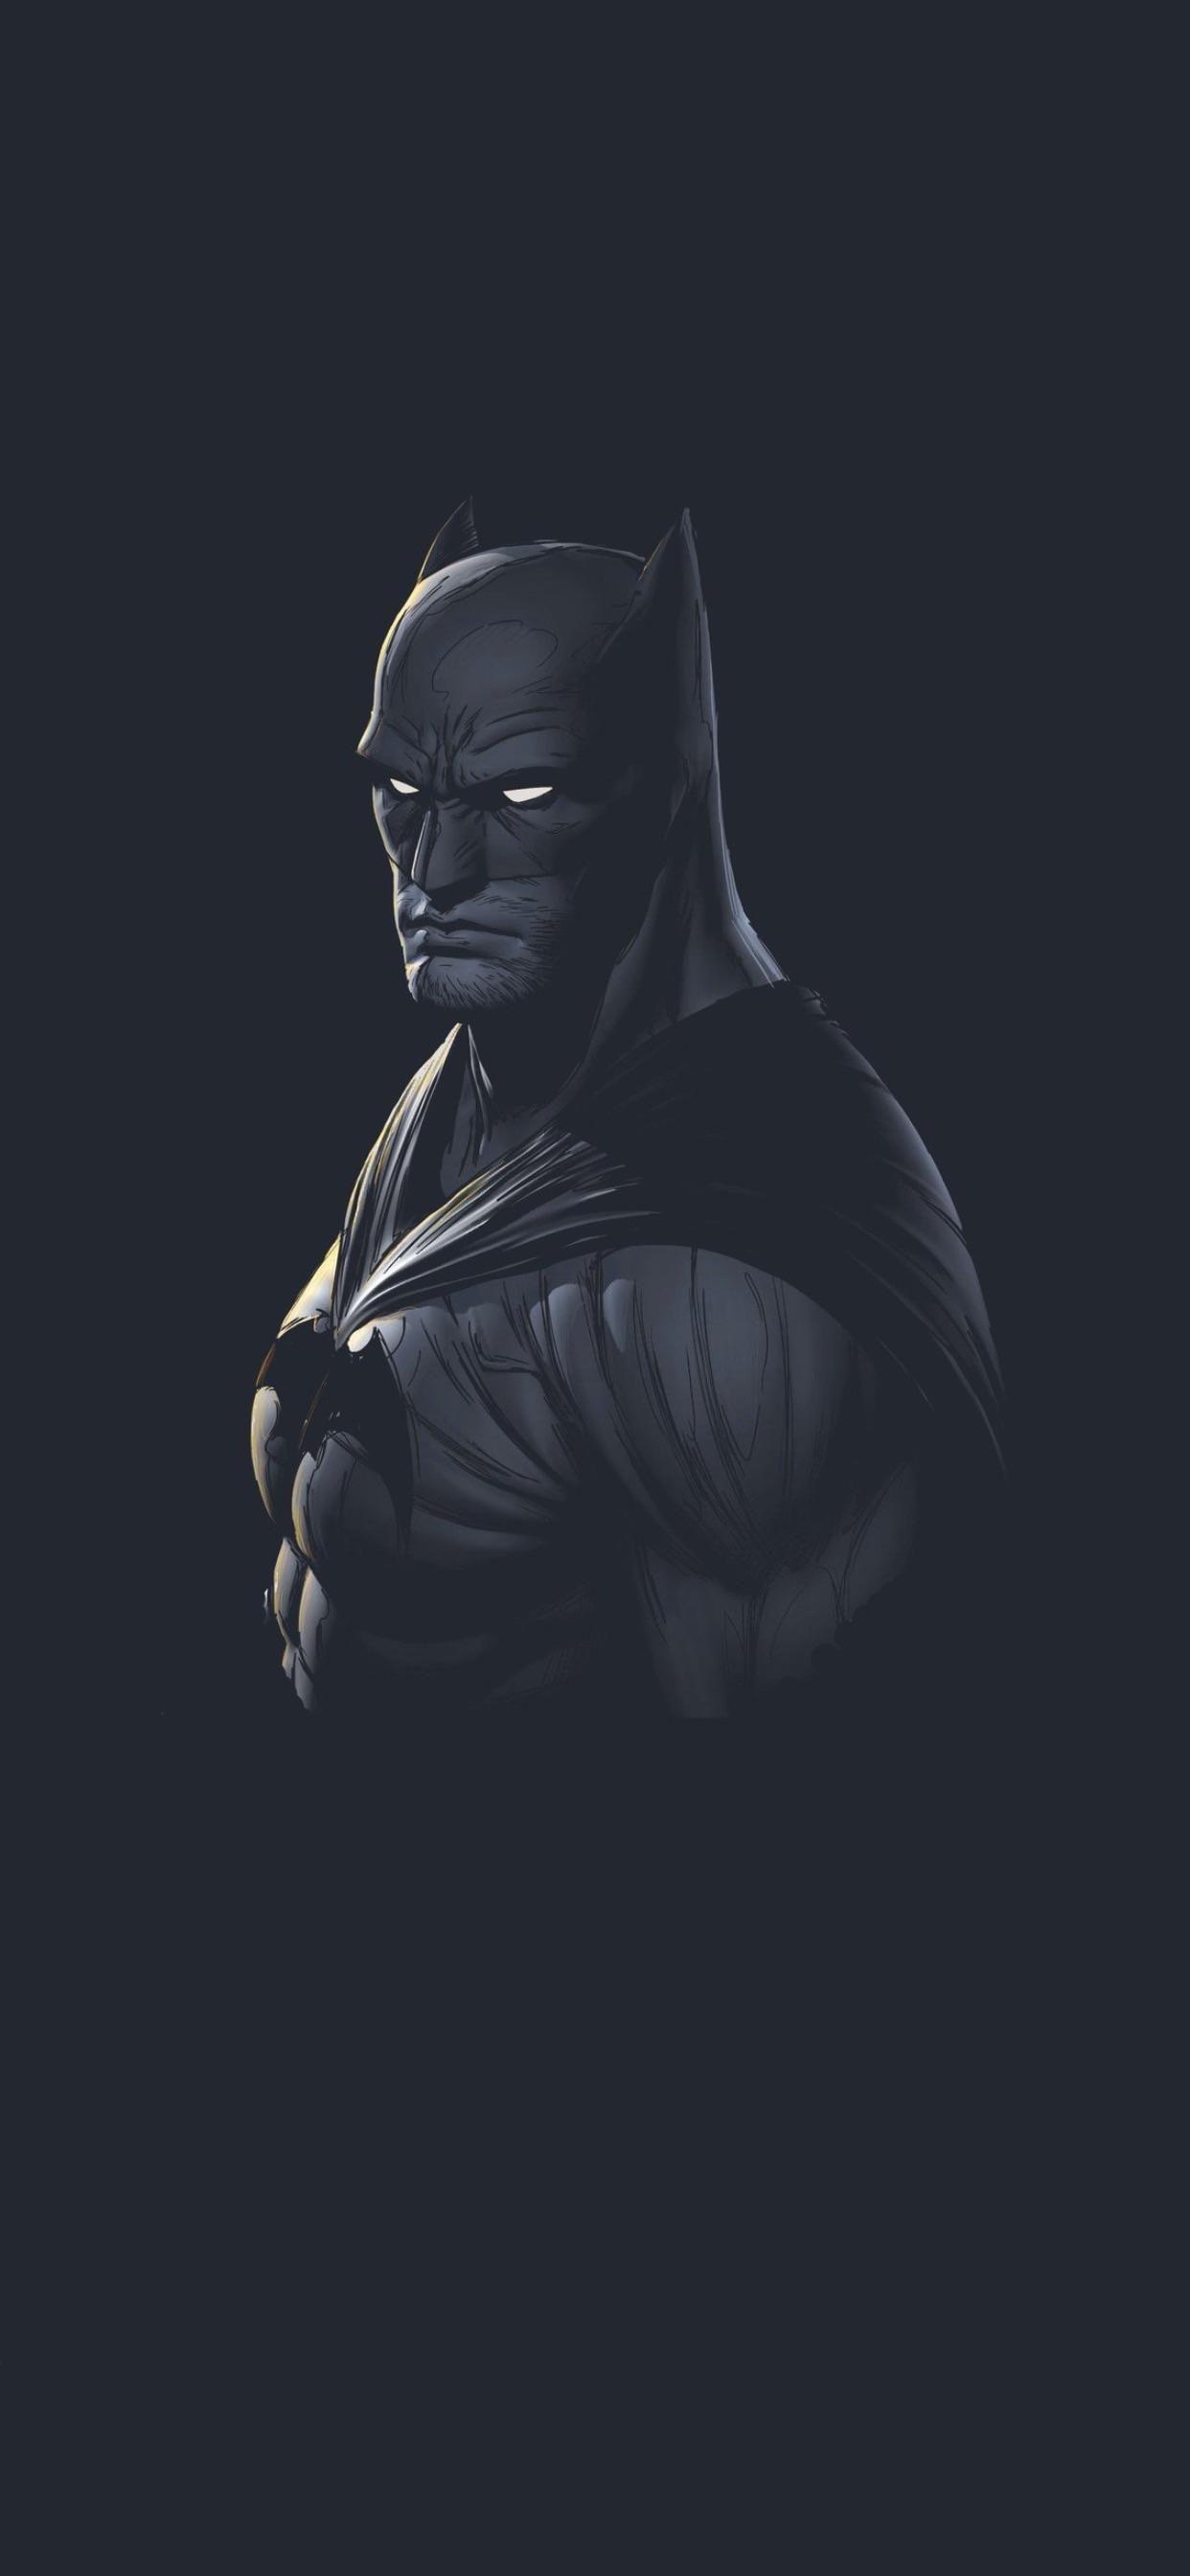 Batman Iphone Wallpapers Iphonewallpaper4k Iphonewallpaperfall